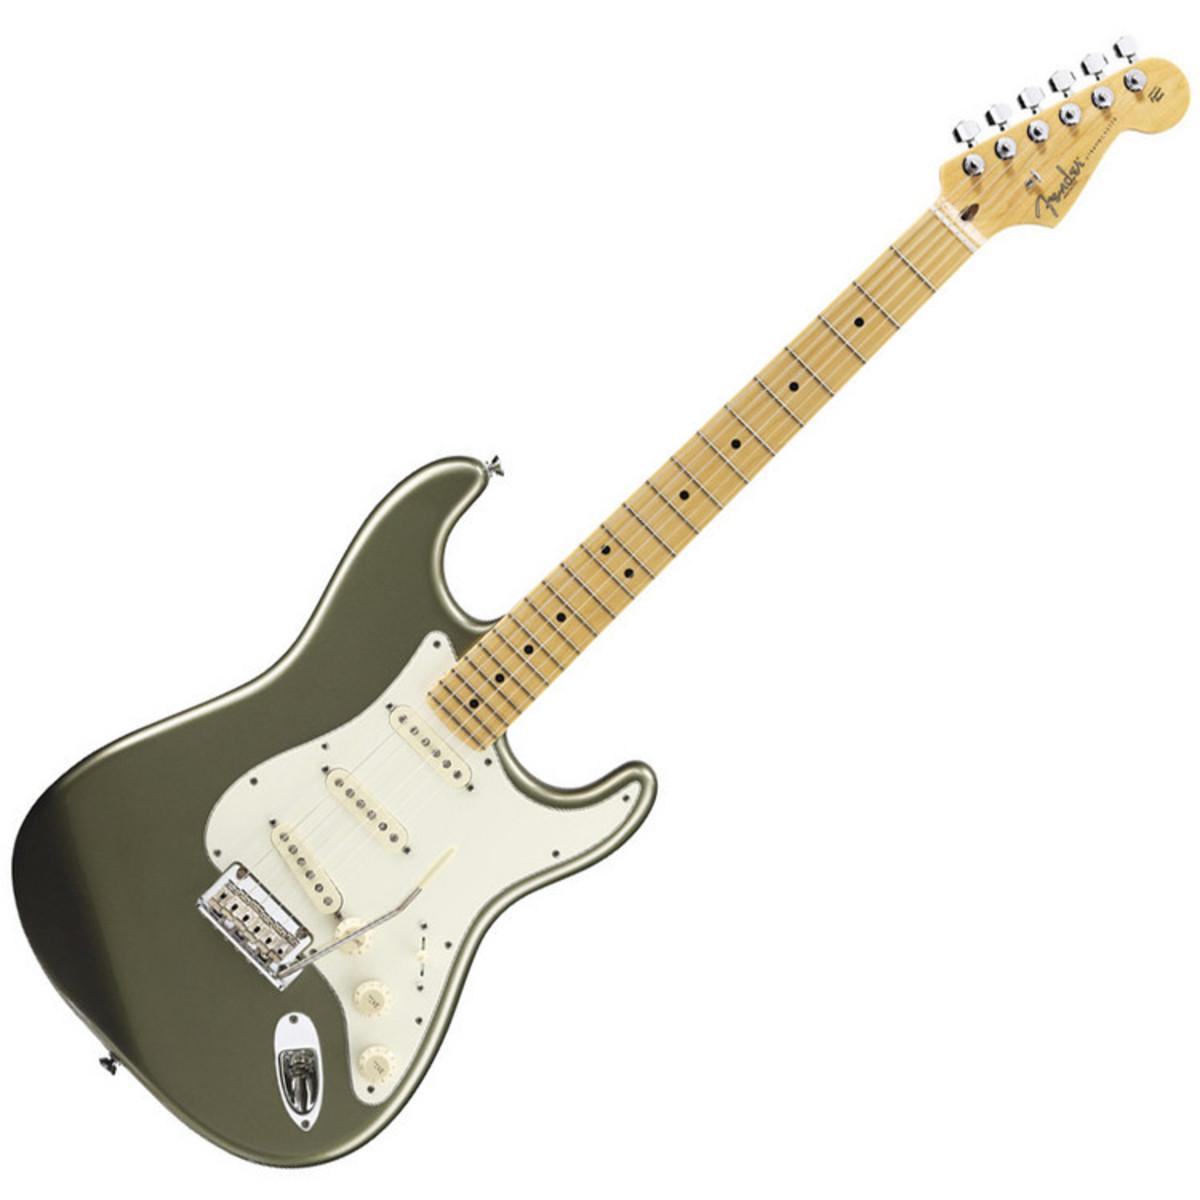 fender american standard stratocaster 2012 mn jade pearl free gift at. Black Bedroom Furniture Sets. Home Design Ideas